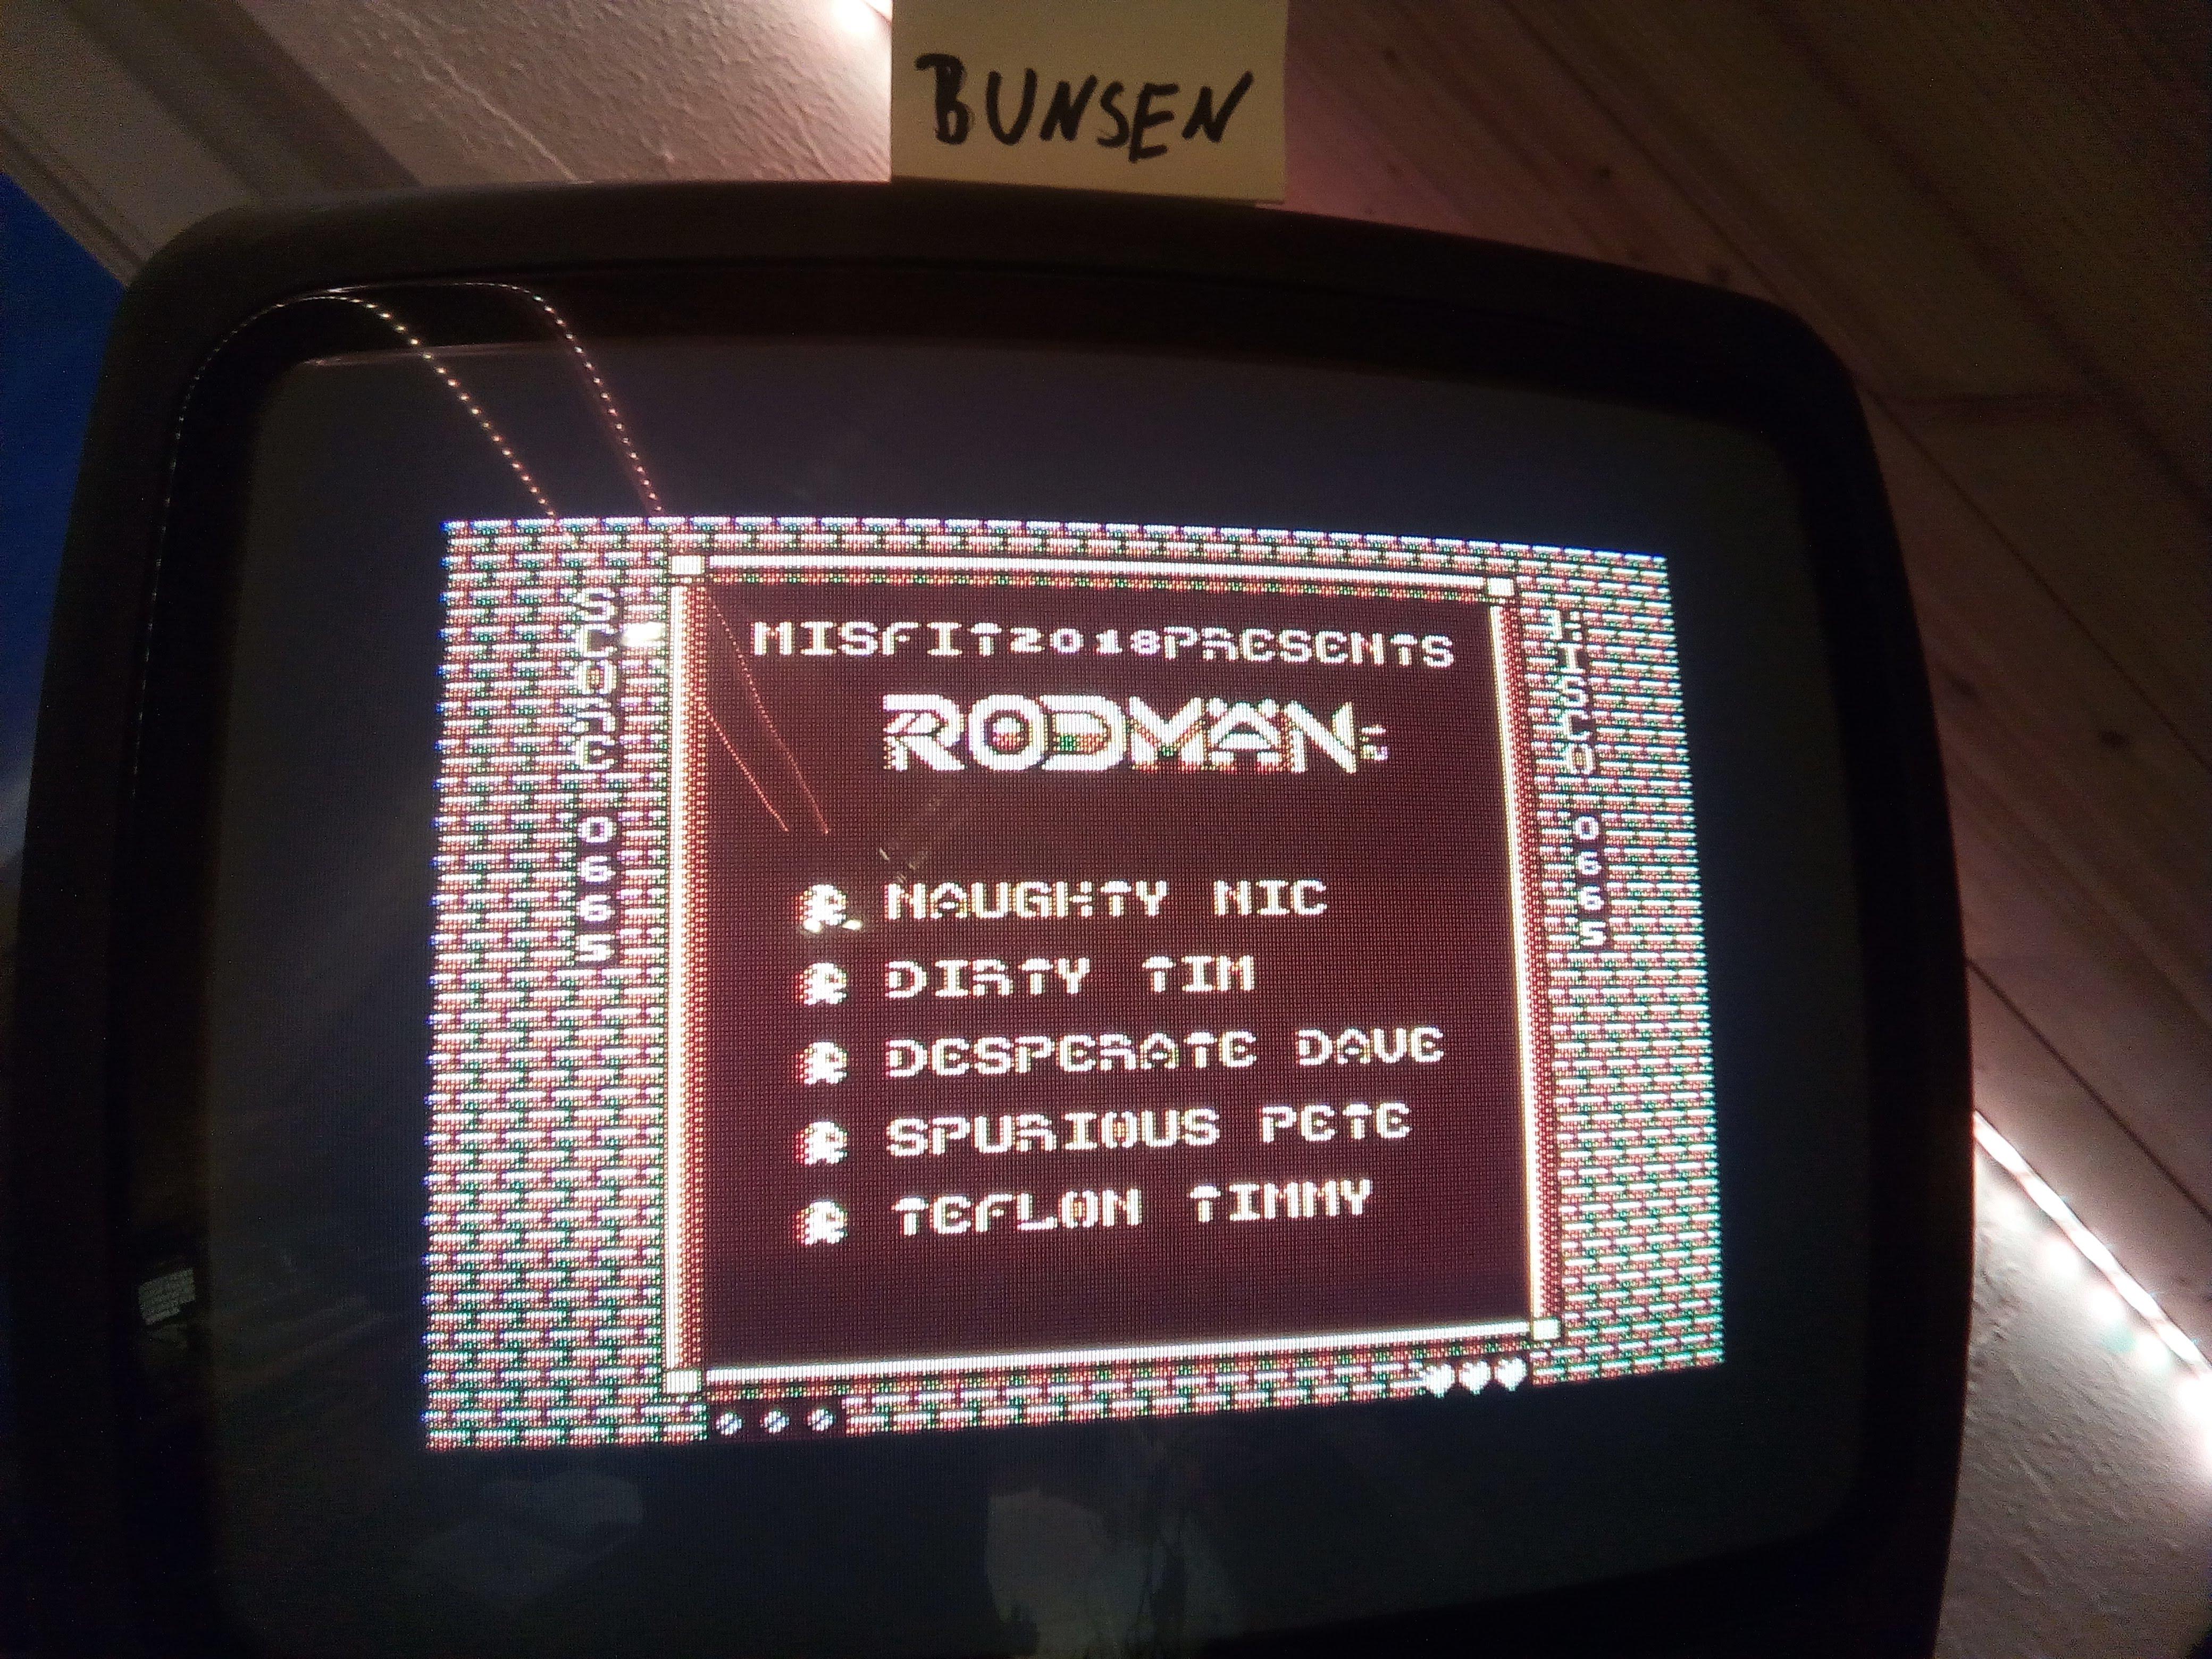 Bunsen: Rodman [HIRES] (Atari 400/800/XL/XE) 665 points on 2020-04-25 16:03:51